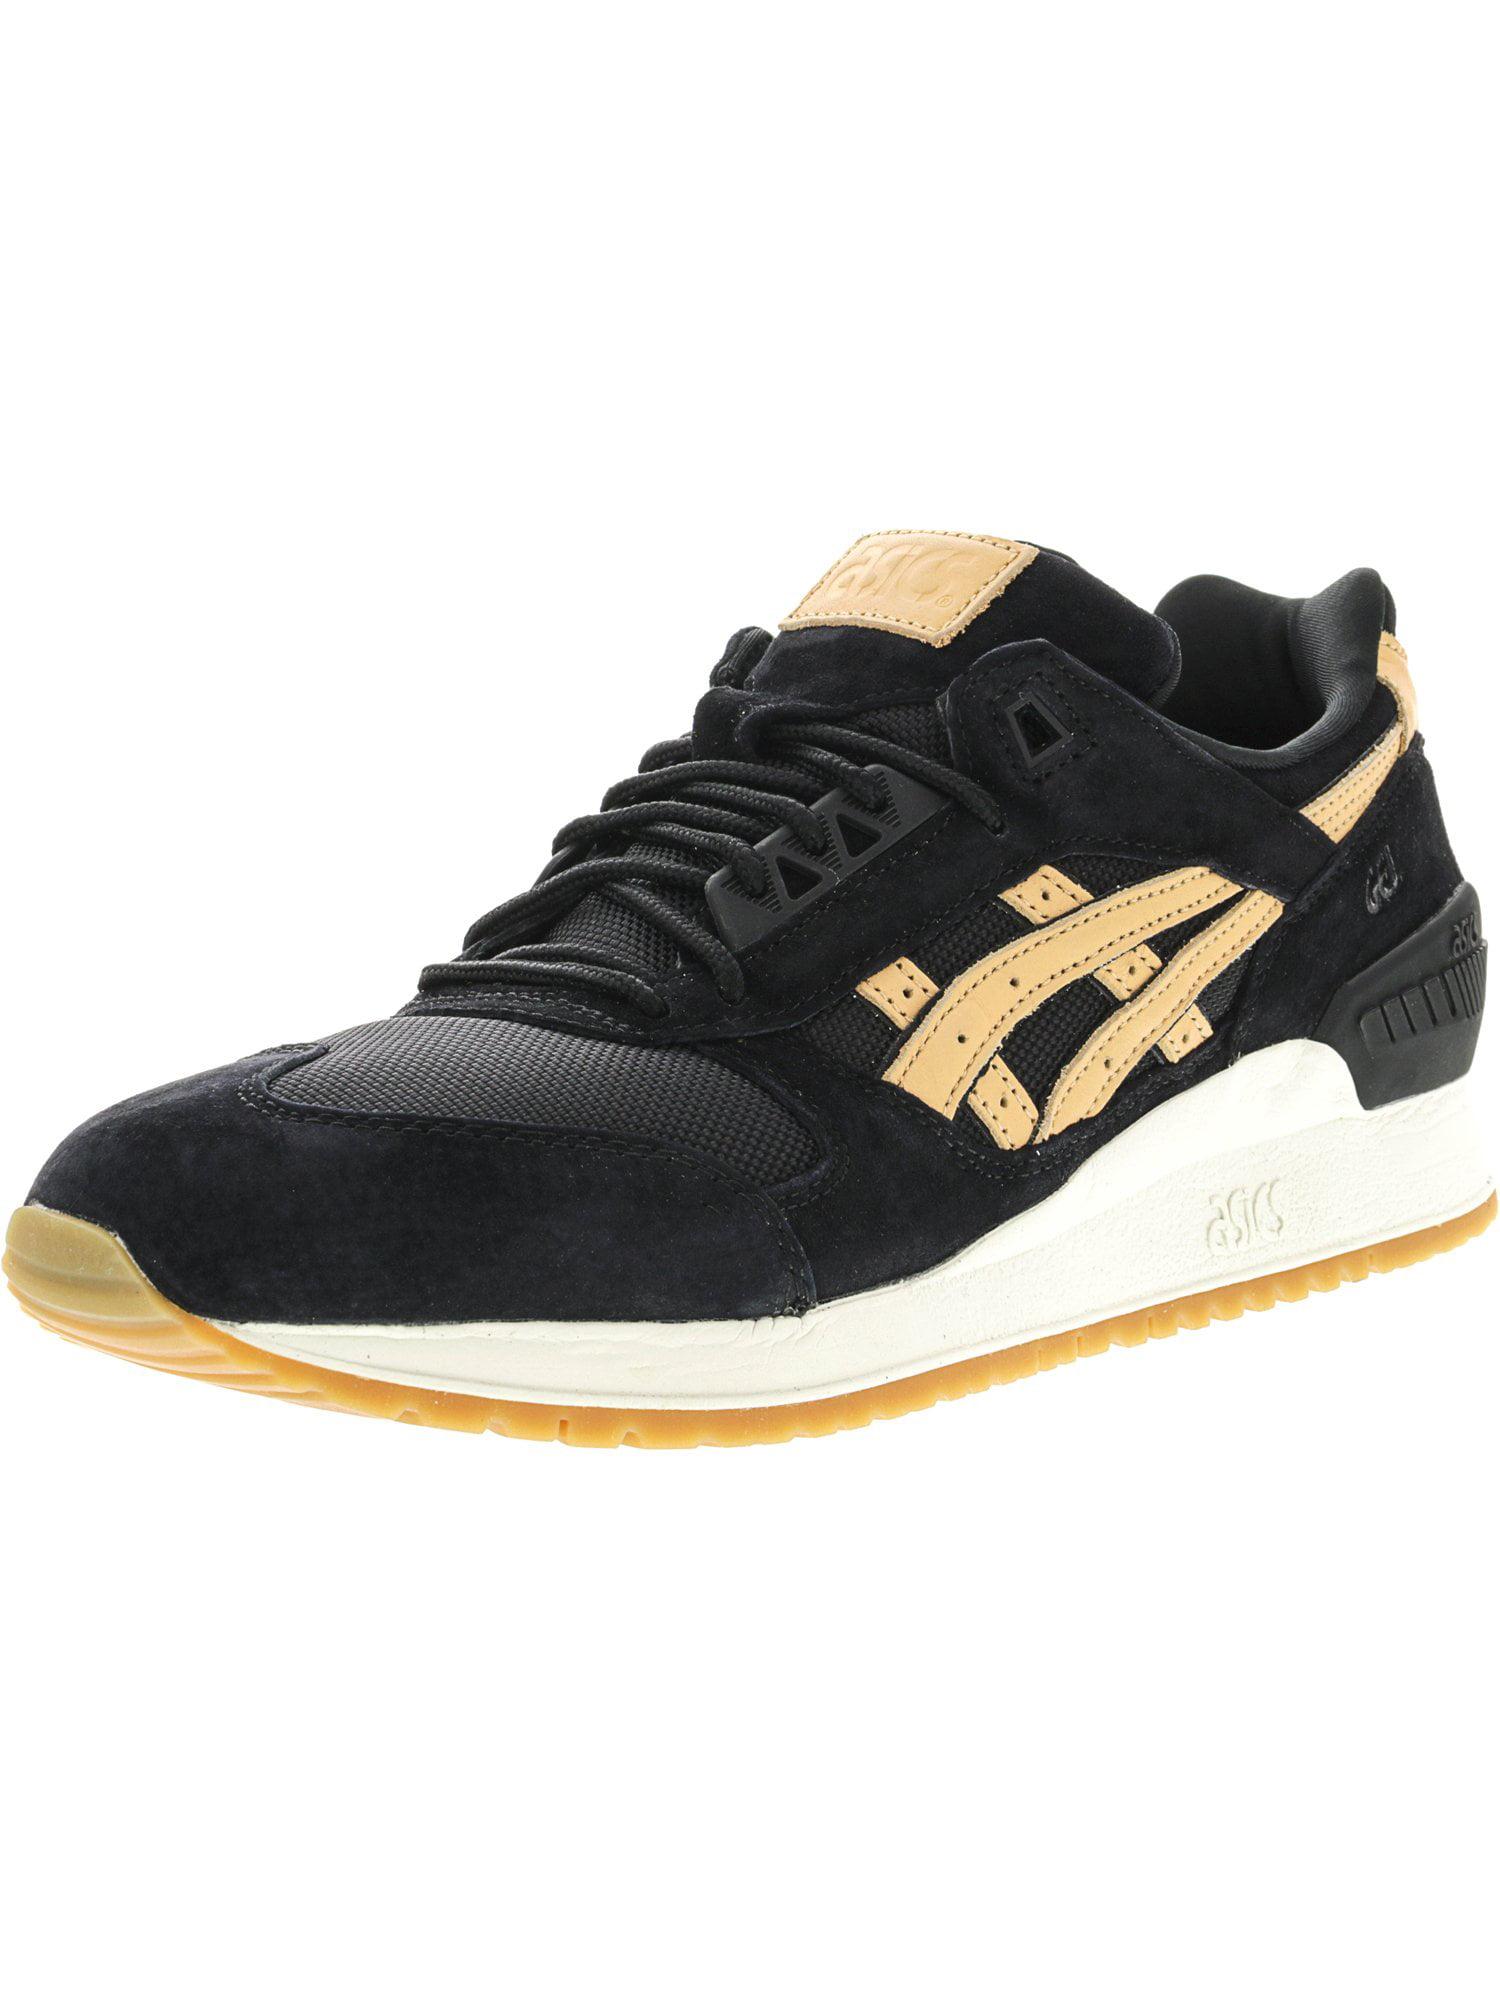 Asics Men's Gel-Respector Black / Sand Ankle-High Suede Fashion Sneaker - 10M